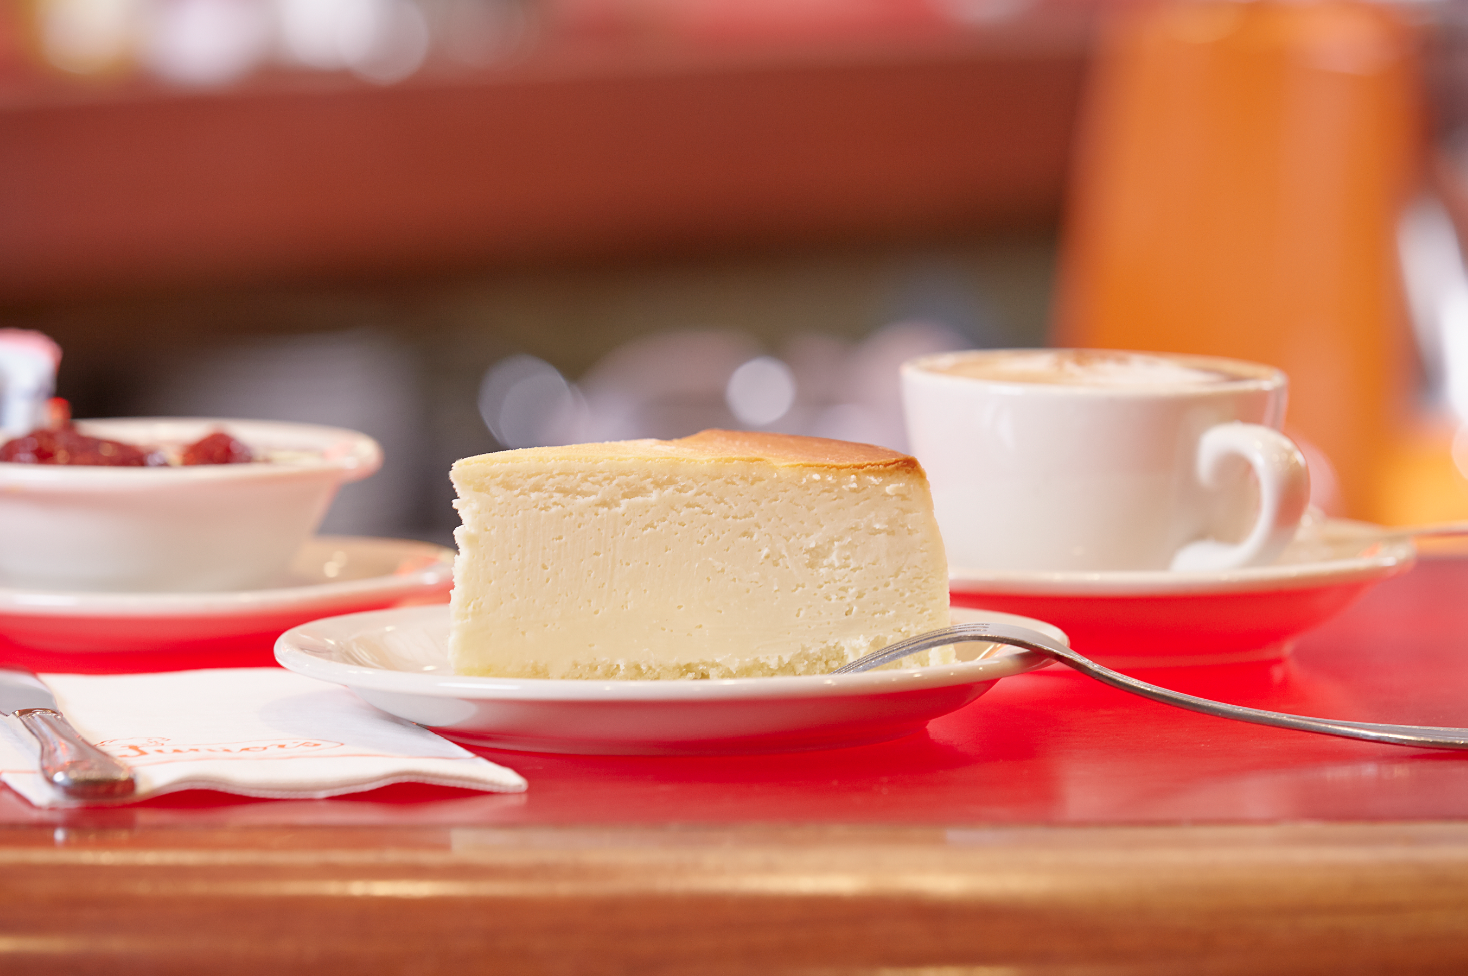 Original NY plain cheesecake at Junior's Restaurant